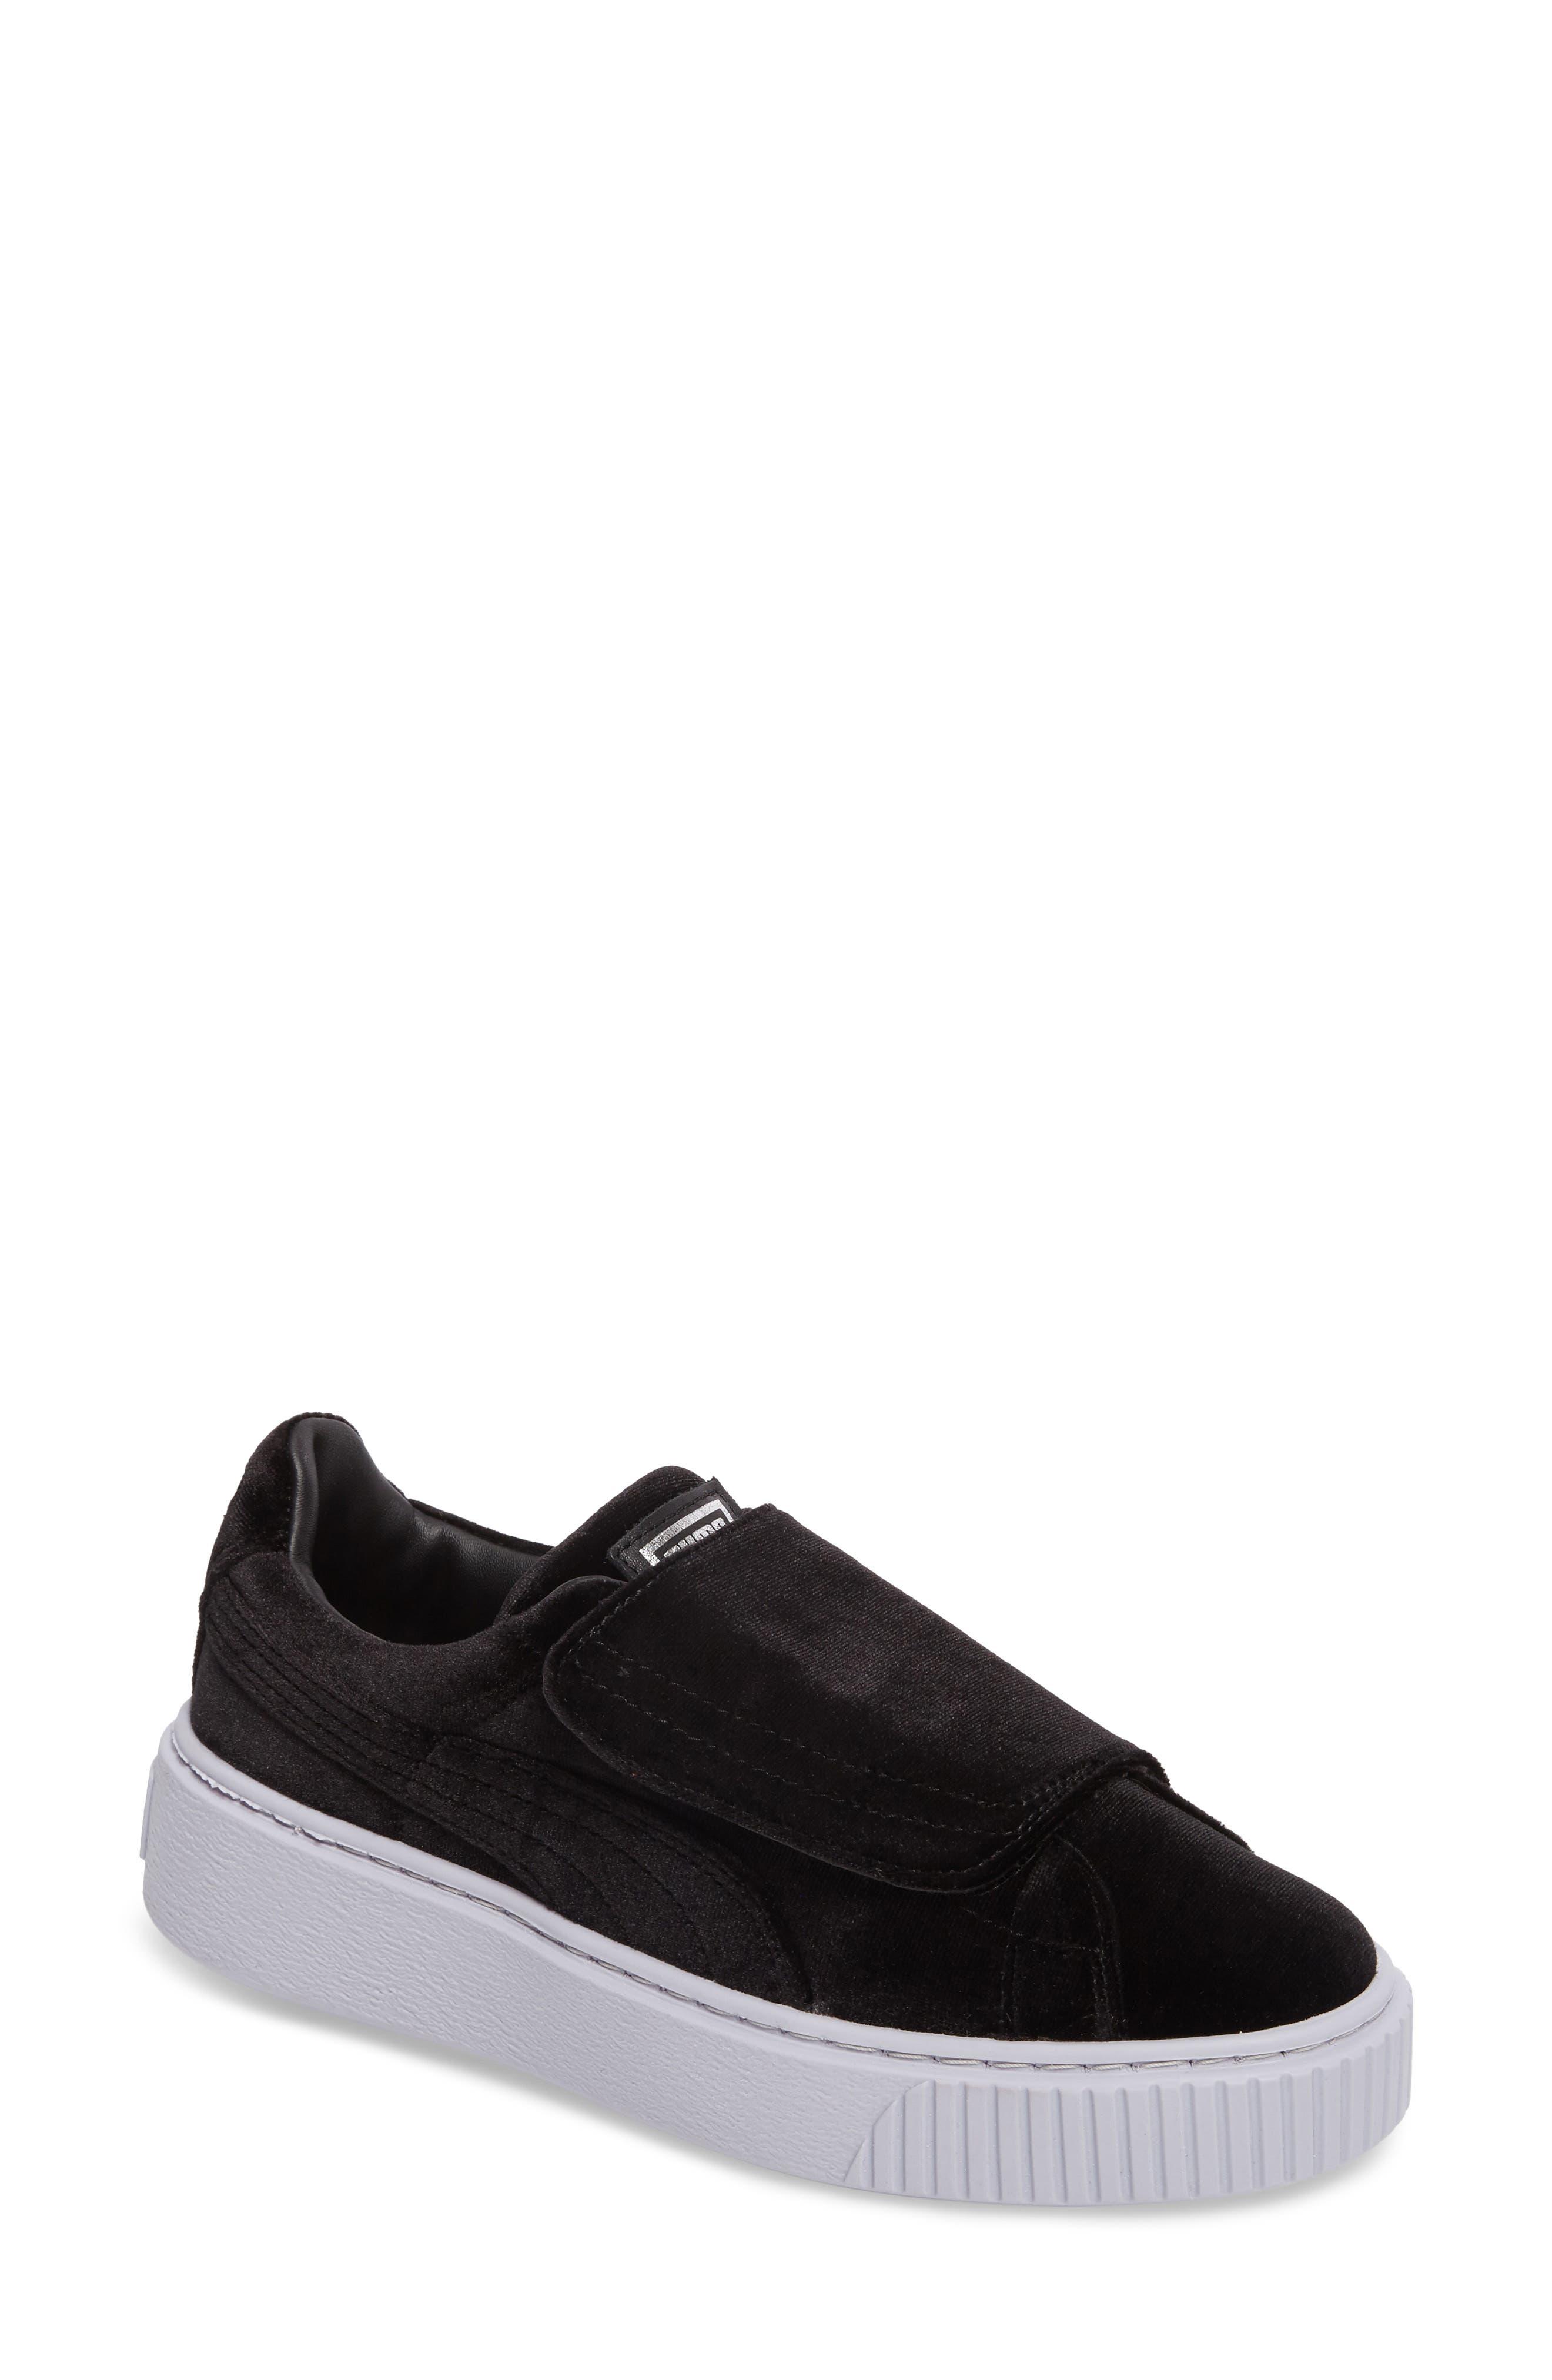 Basket Platform Sneaker,                             Main thumbnail 1, color,                             002